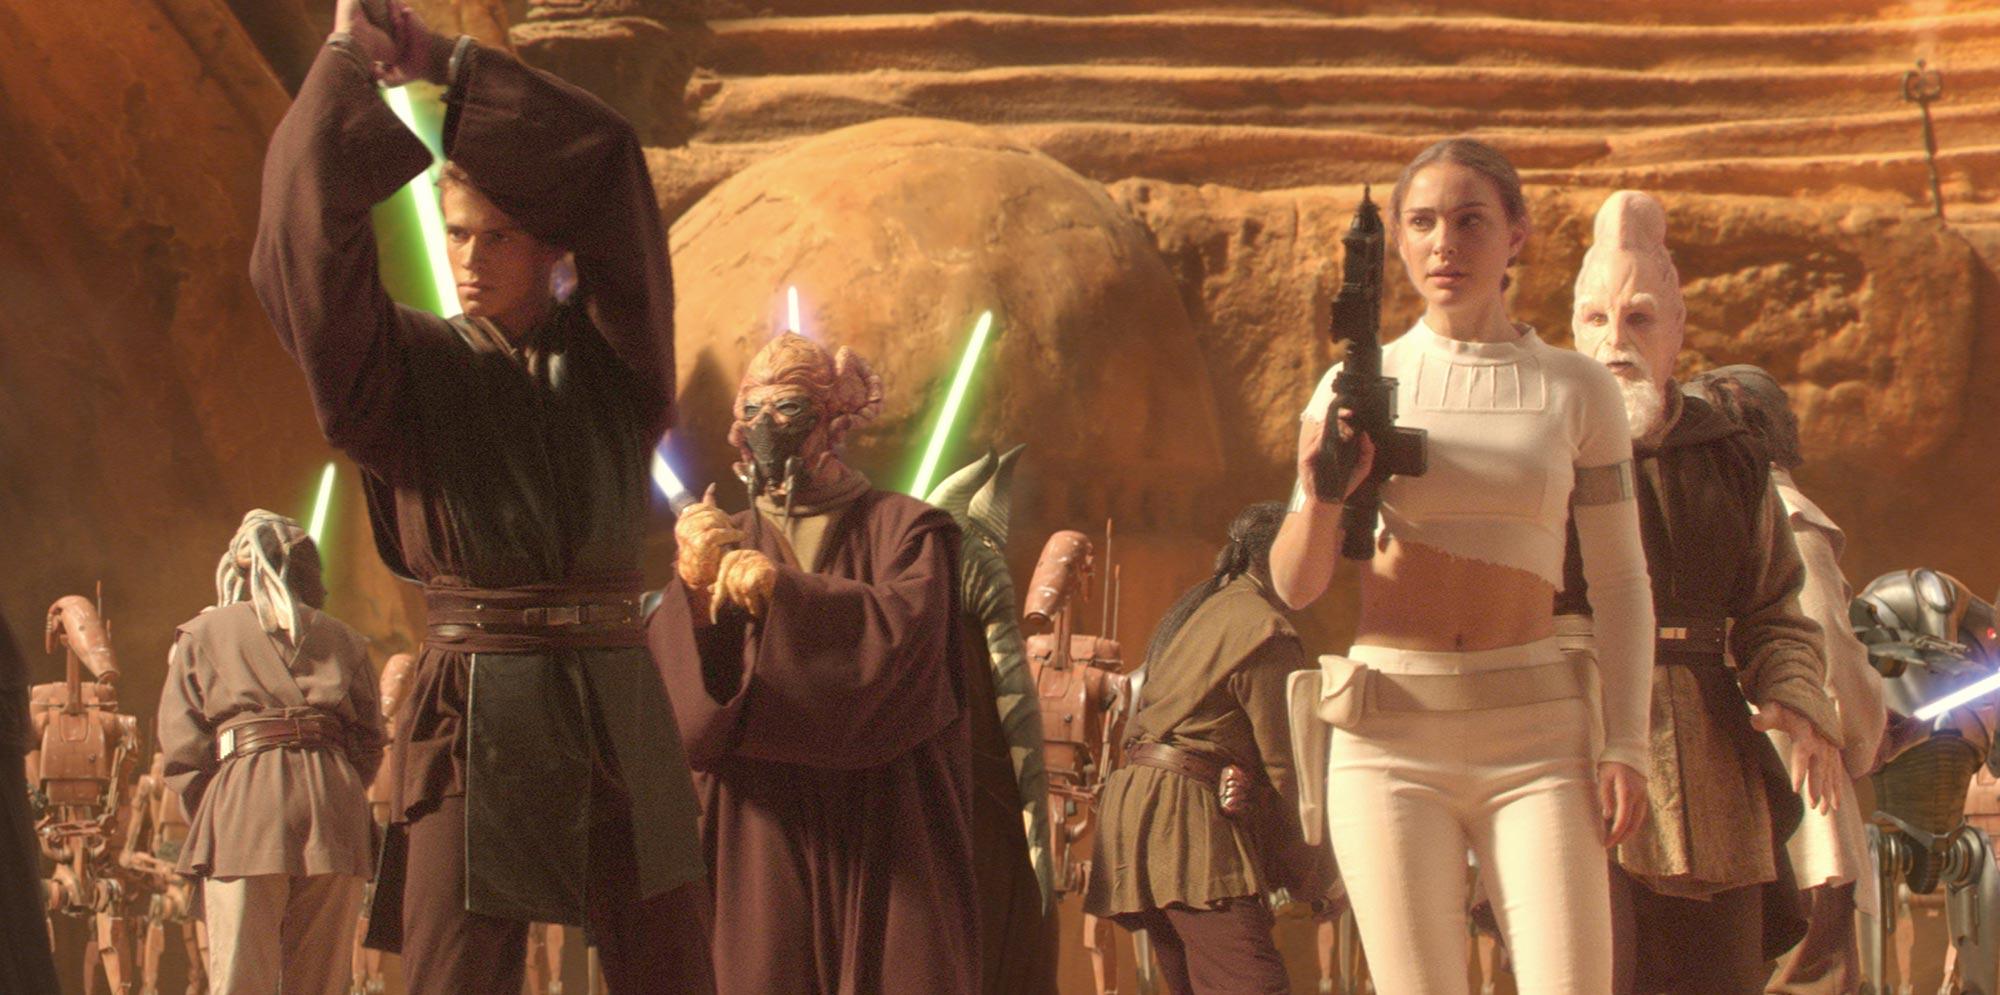 Star Wars Ranking Star Wars: Episode II - Attack of the Clones